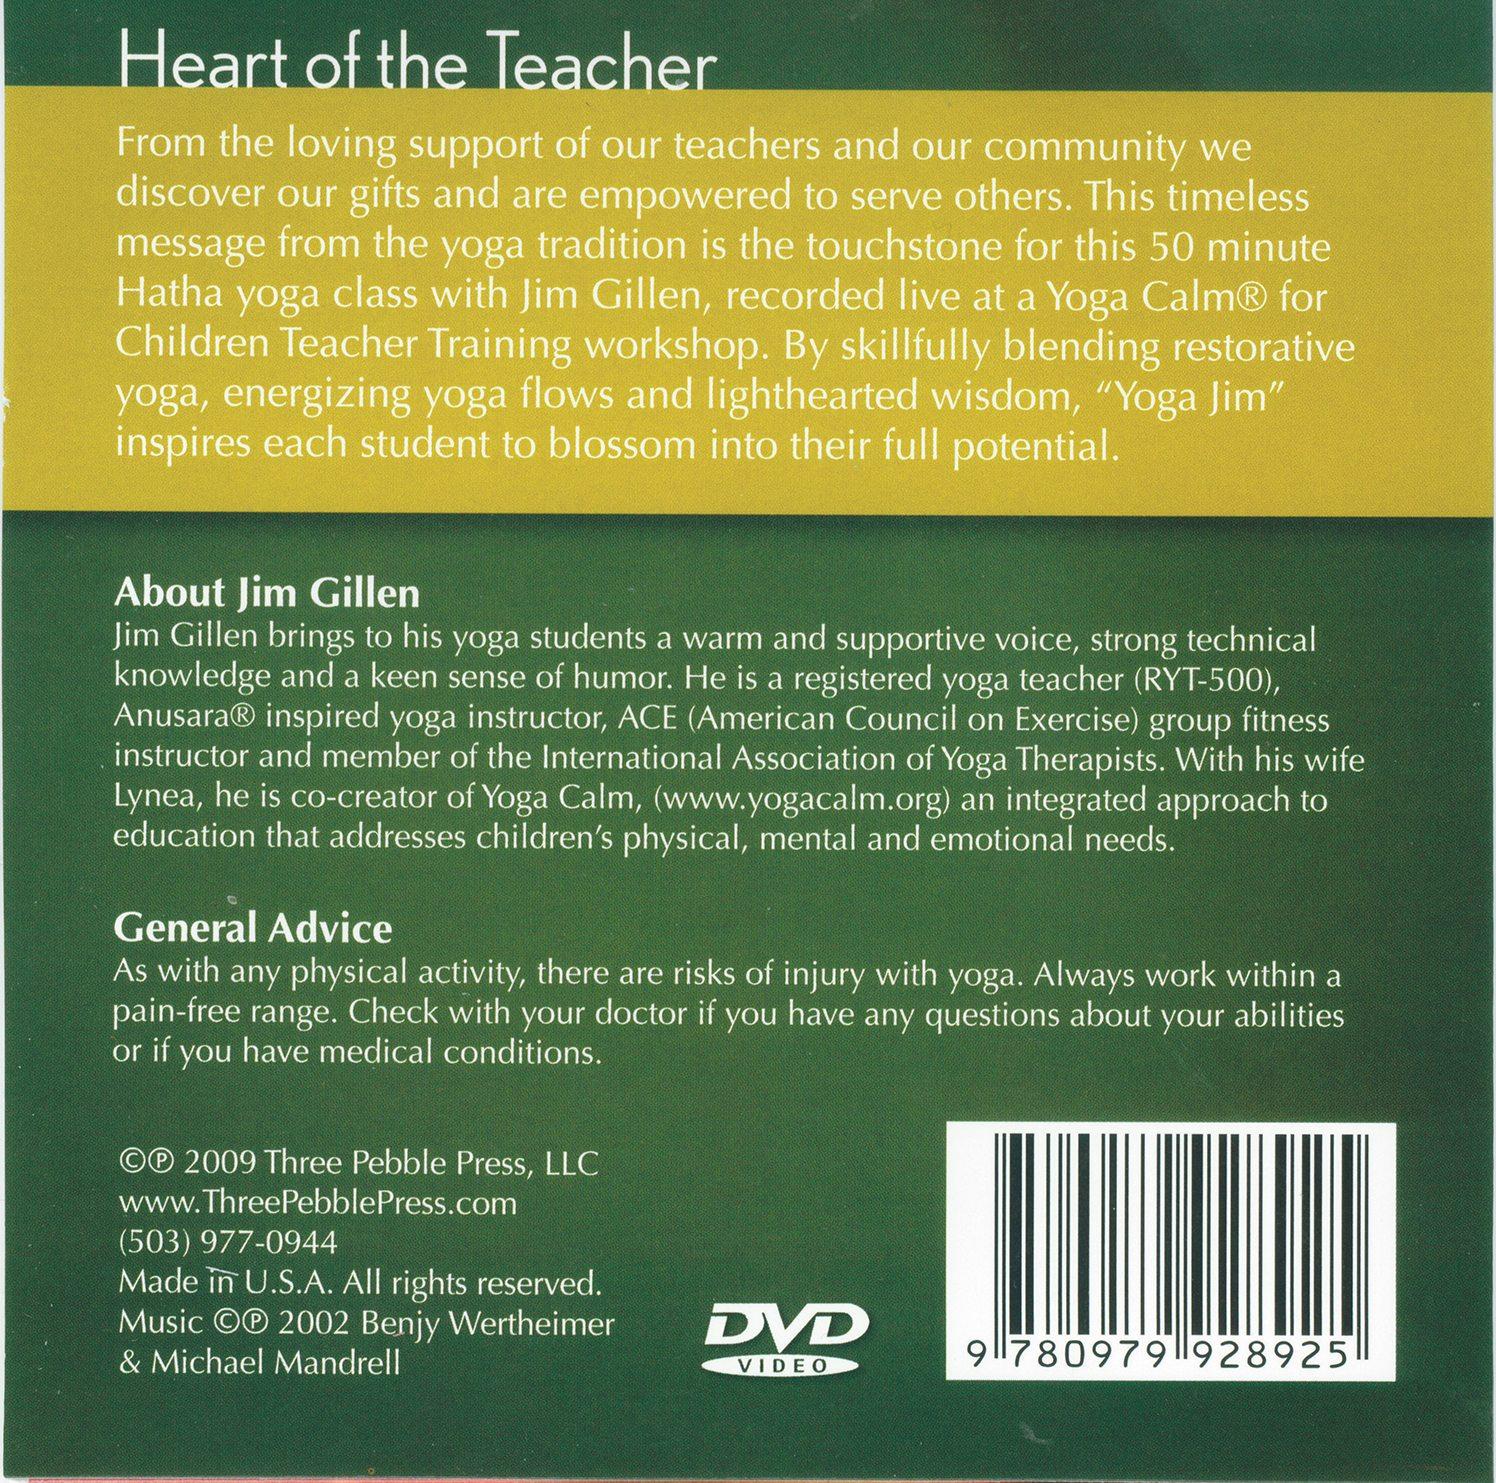 Heart of the Teacher Yoga DVD